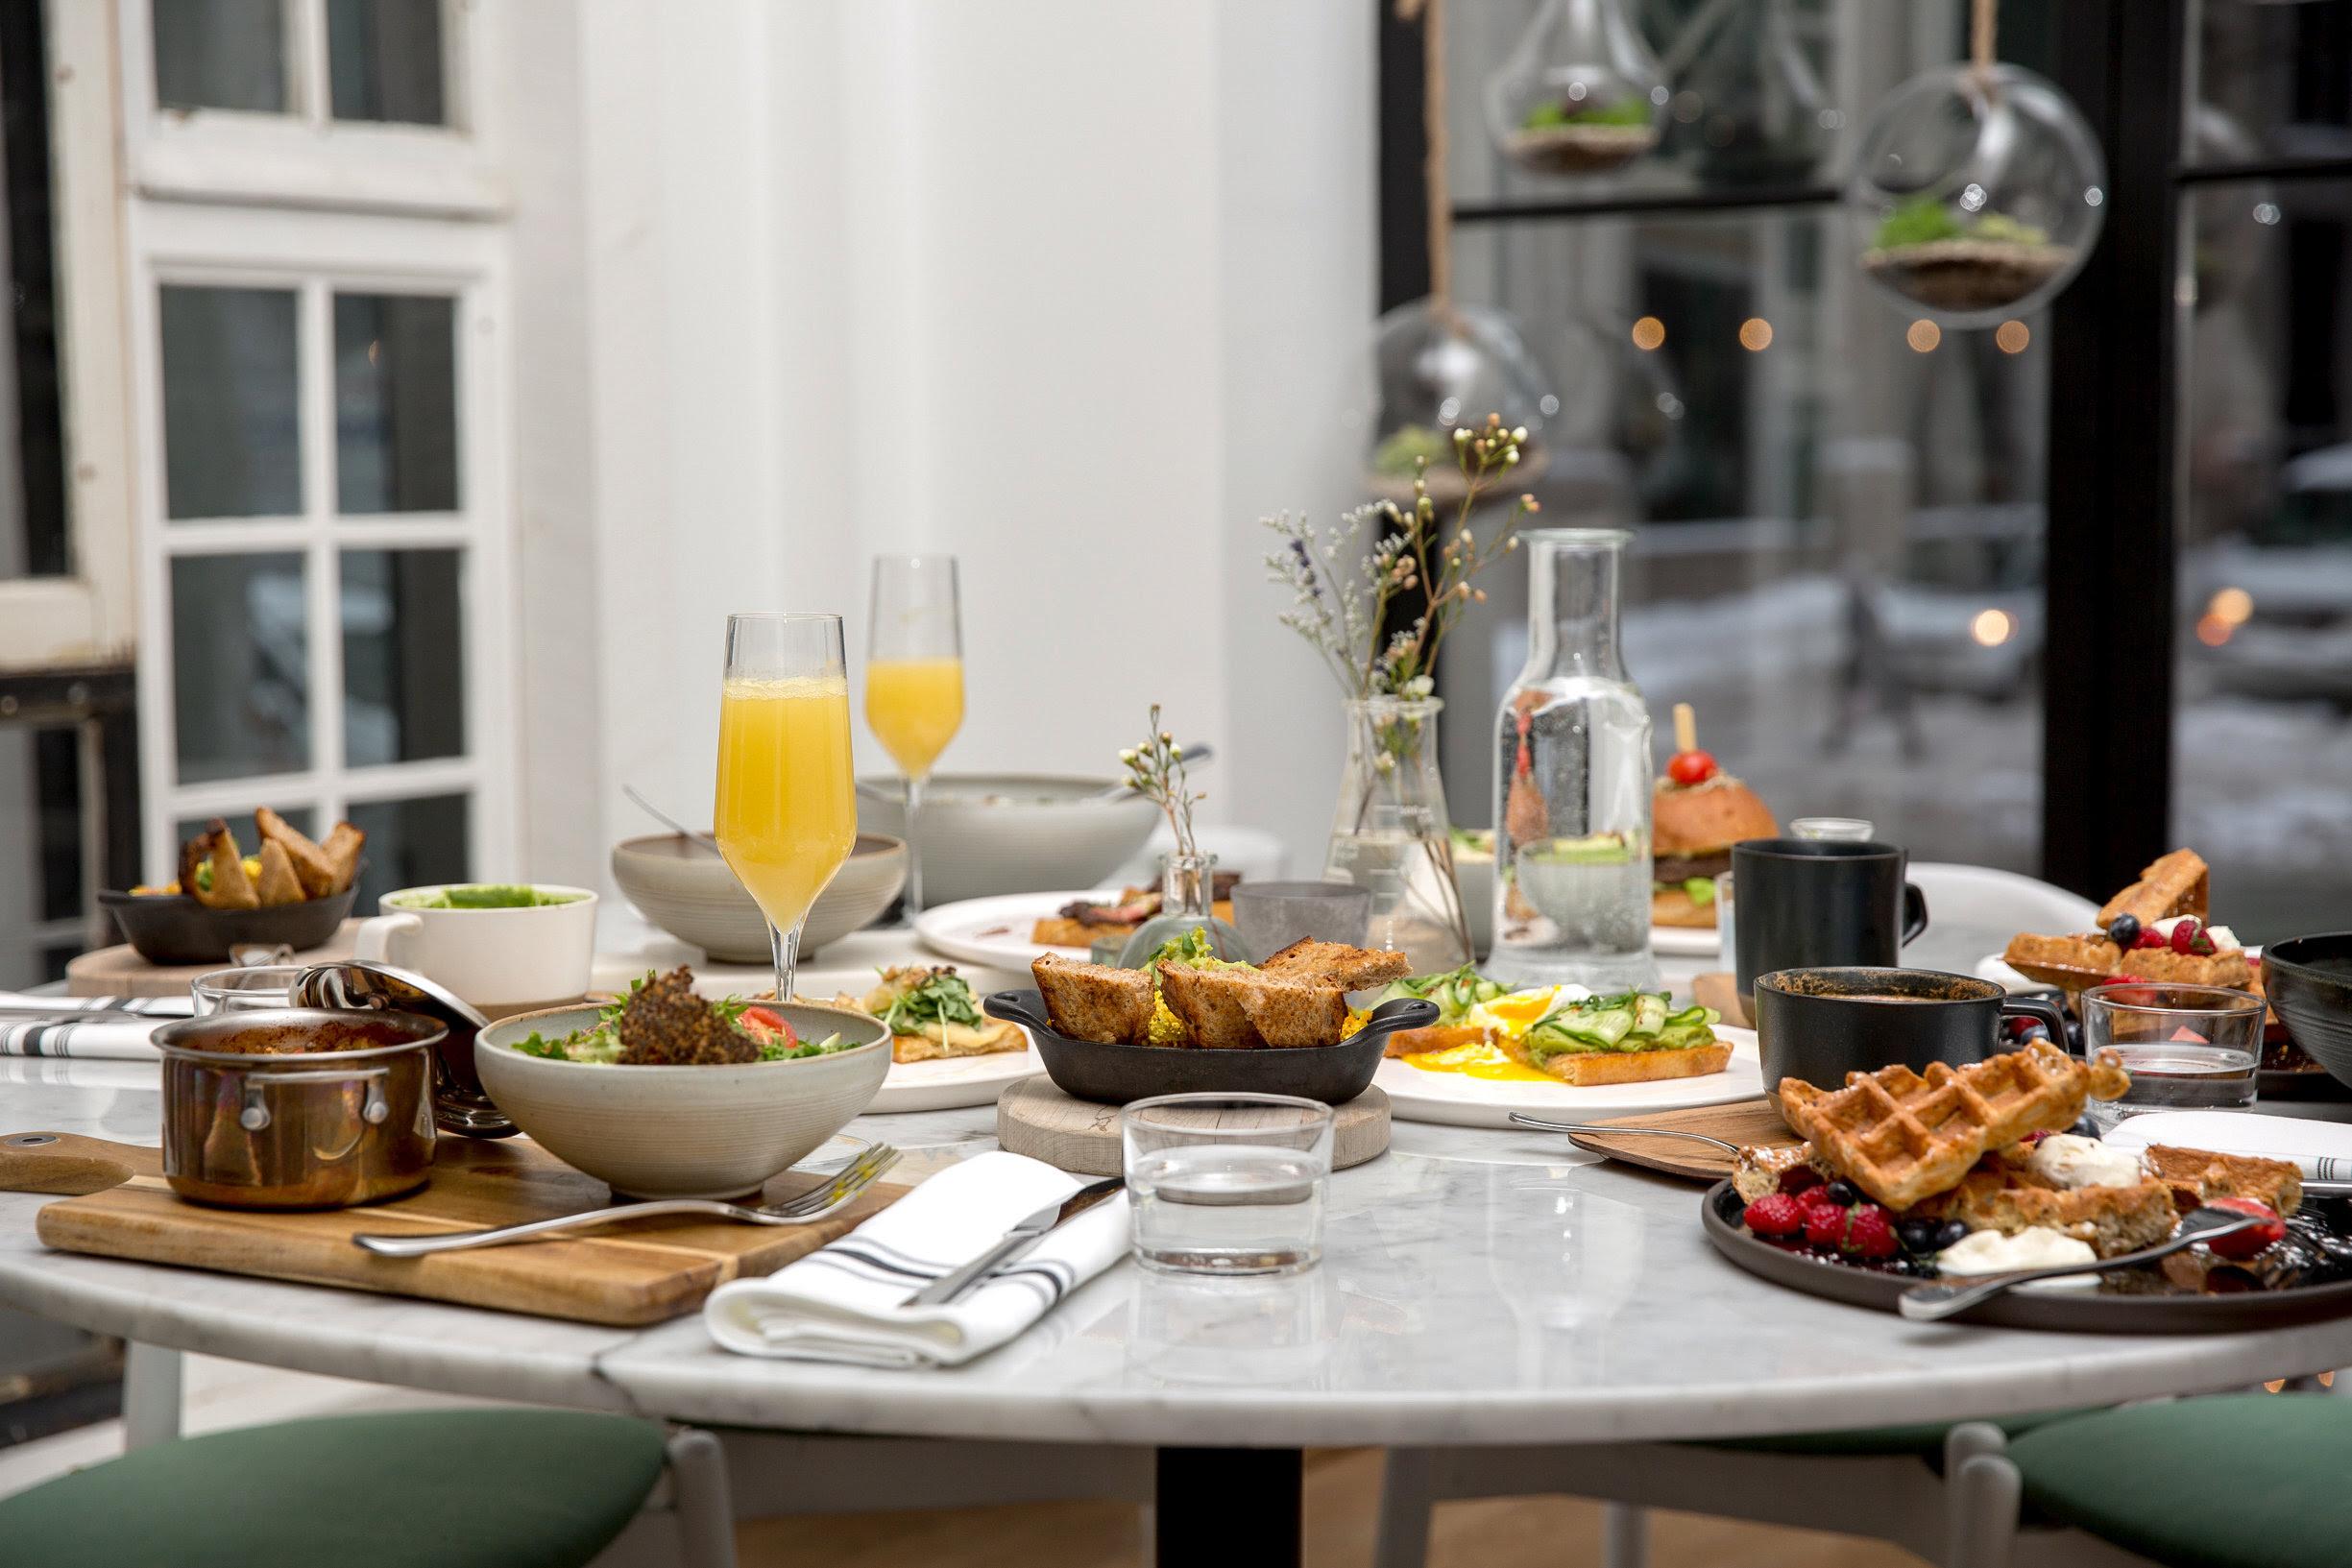 lov , a new botanical restaurant in Old Montreal, lifestyle blog mademoiselle jules, mlle jules, brunch